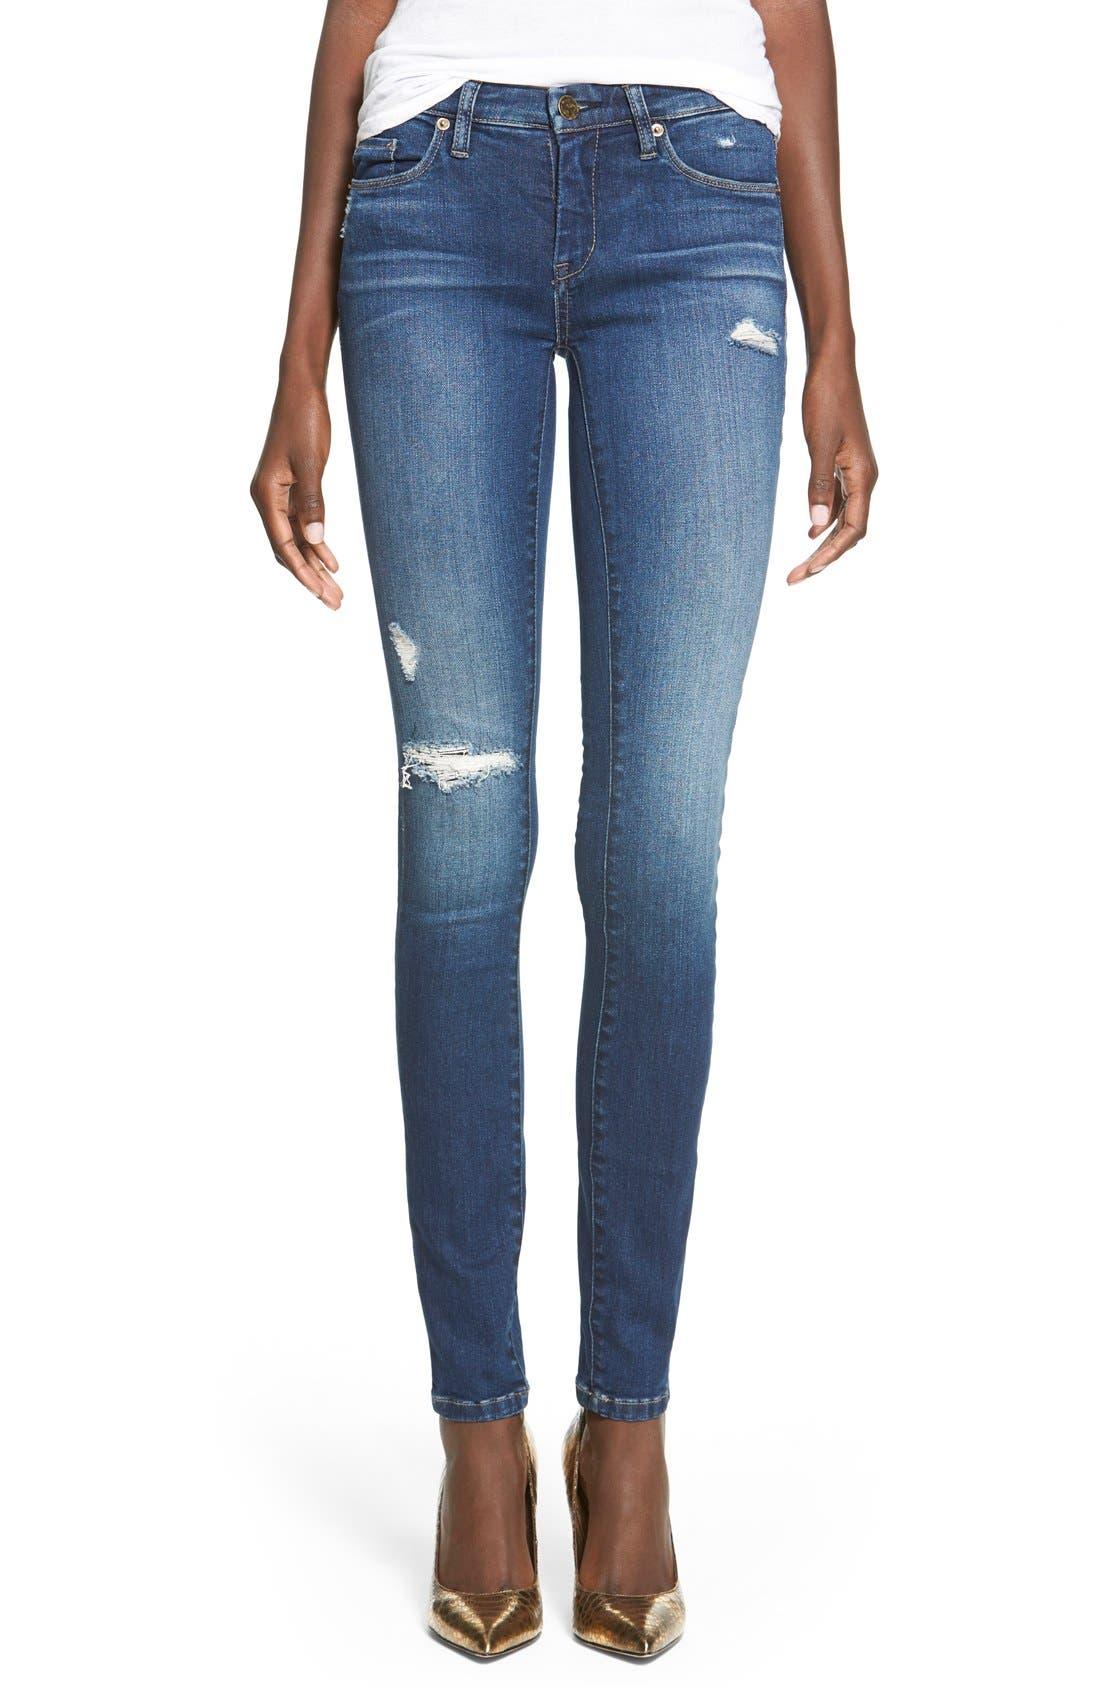 Main Image - BLANKNYC'Hotel' Distressed Skinny Jeans (Blue)